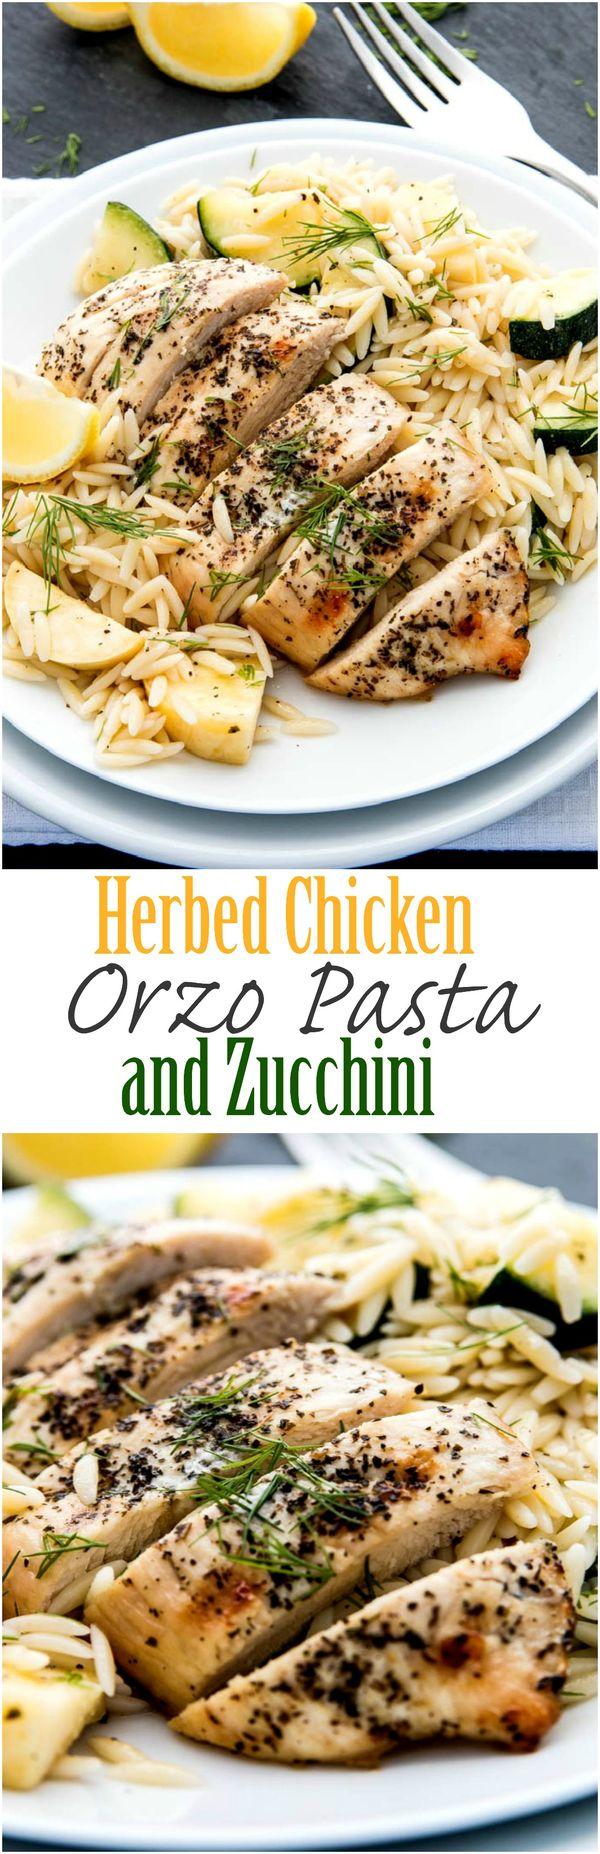 Herbed Chicken Orzo Pasta and Zucchini